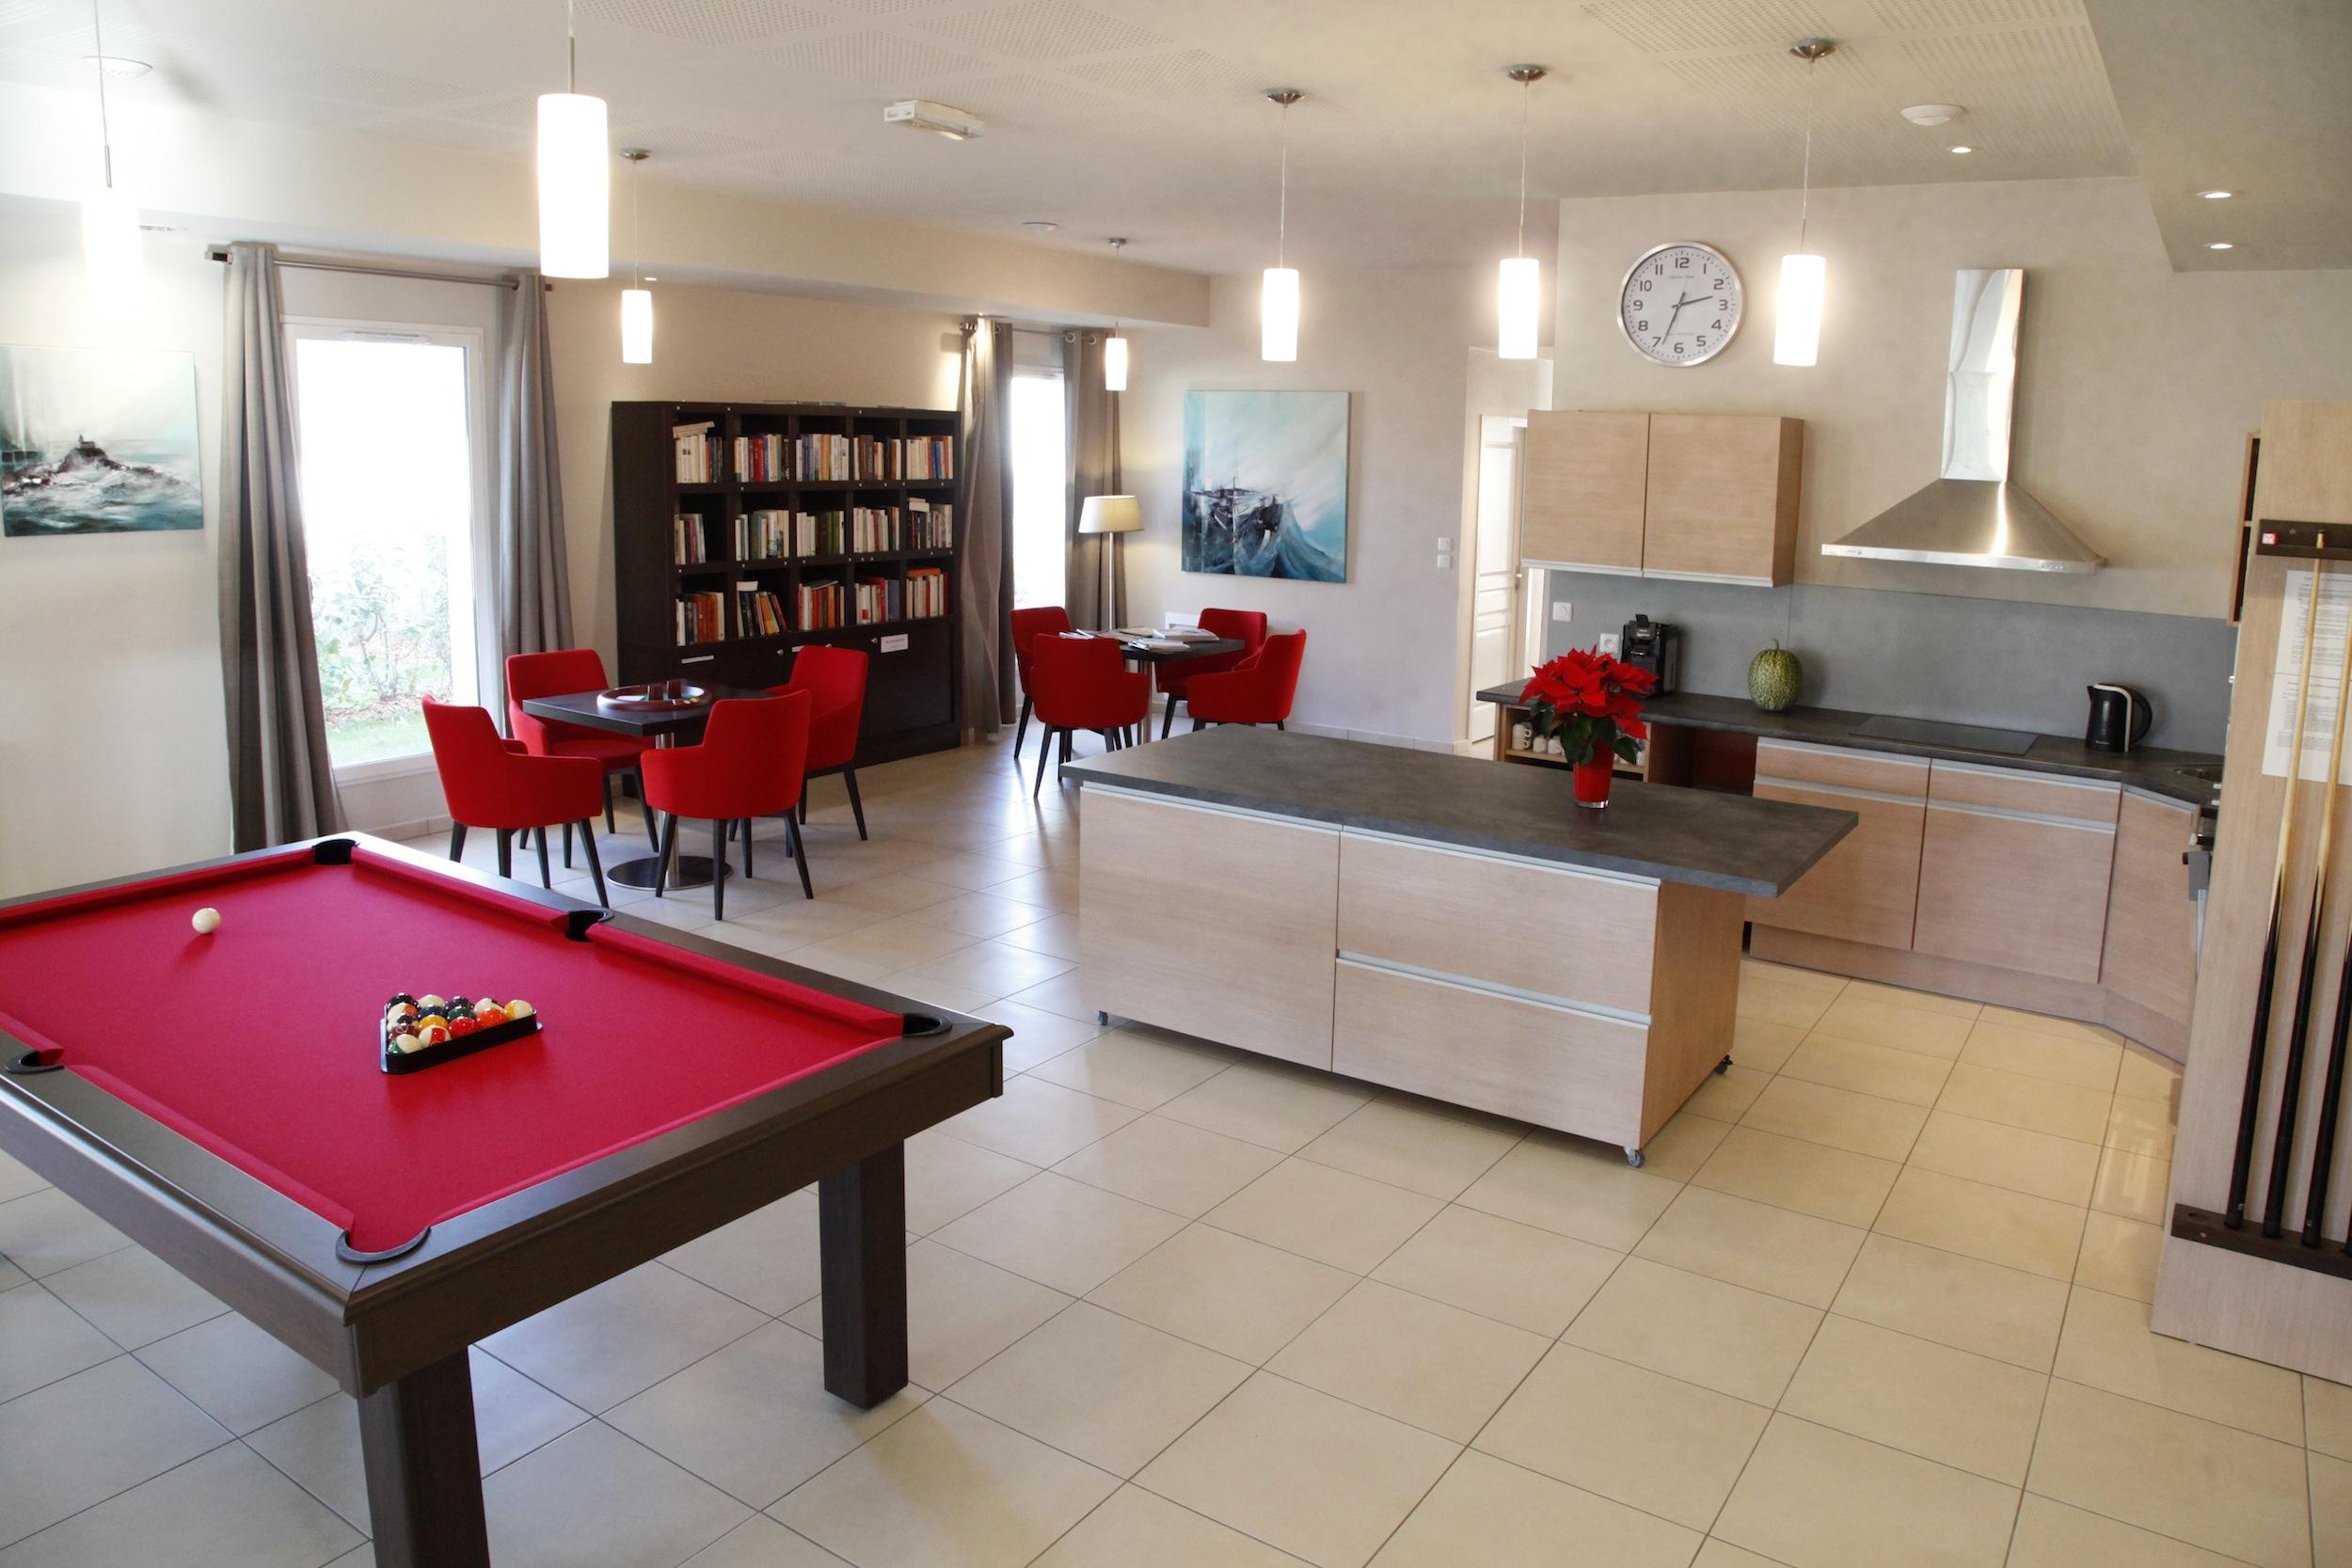 r sidence service r sidence les senioriales de pont aven residence avec services pour. Black Bedroom Furniture Sets. Home Design Ideas